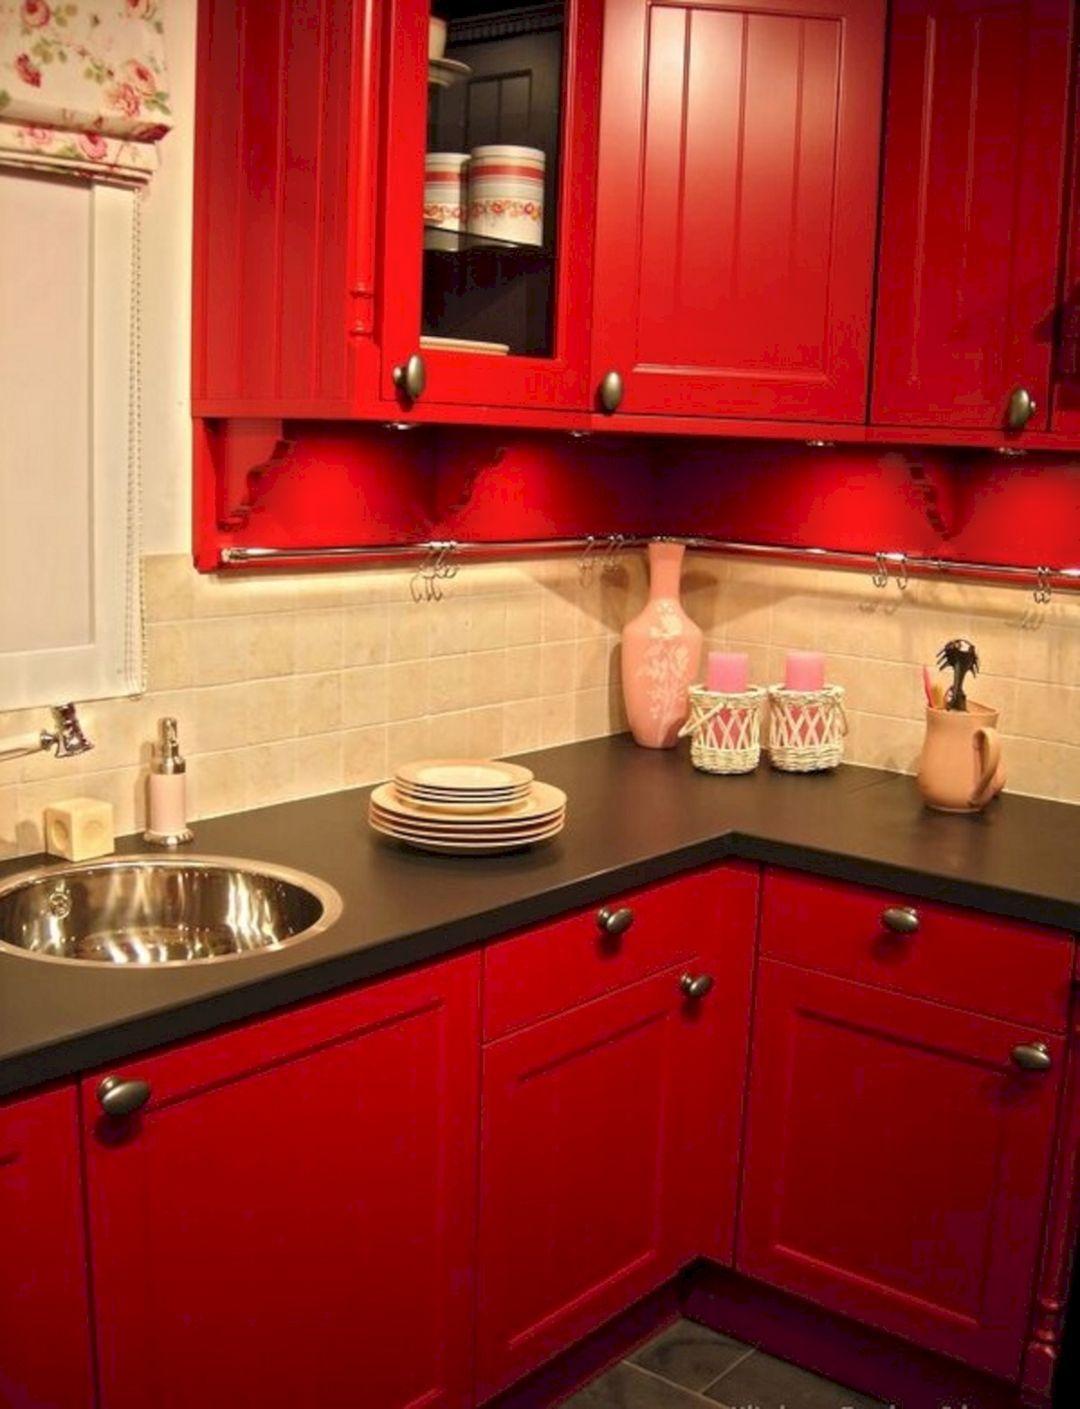 Red And Black Kitchen Ideas 21 Red Kitchen Cabinets Kitchen Design Small Kitchen Design Color